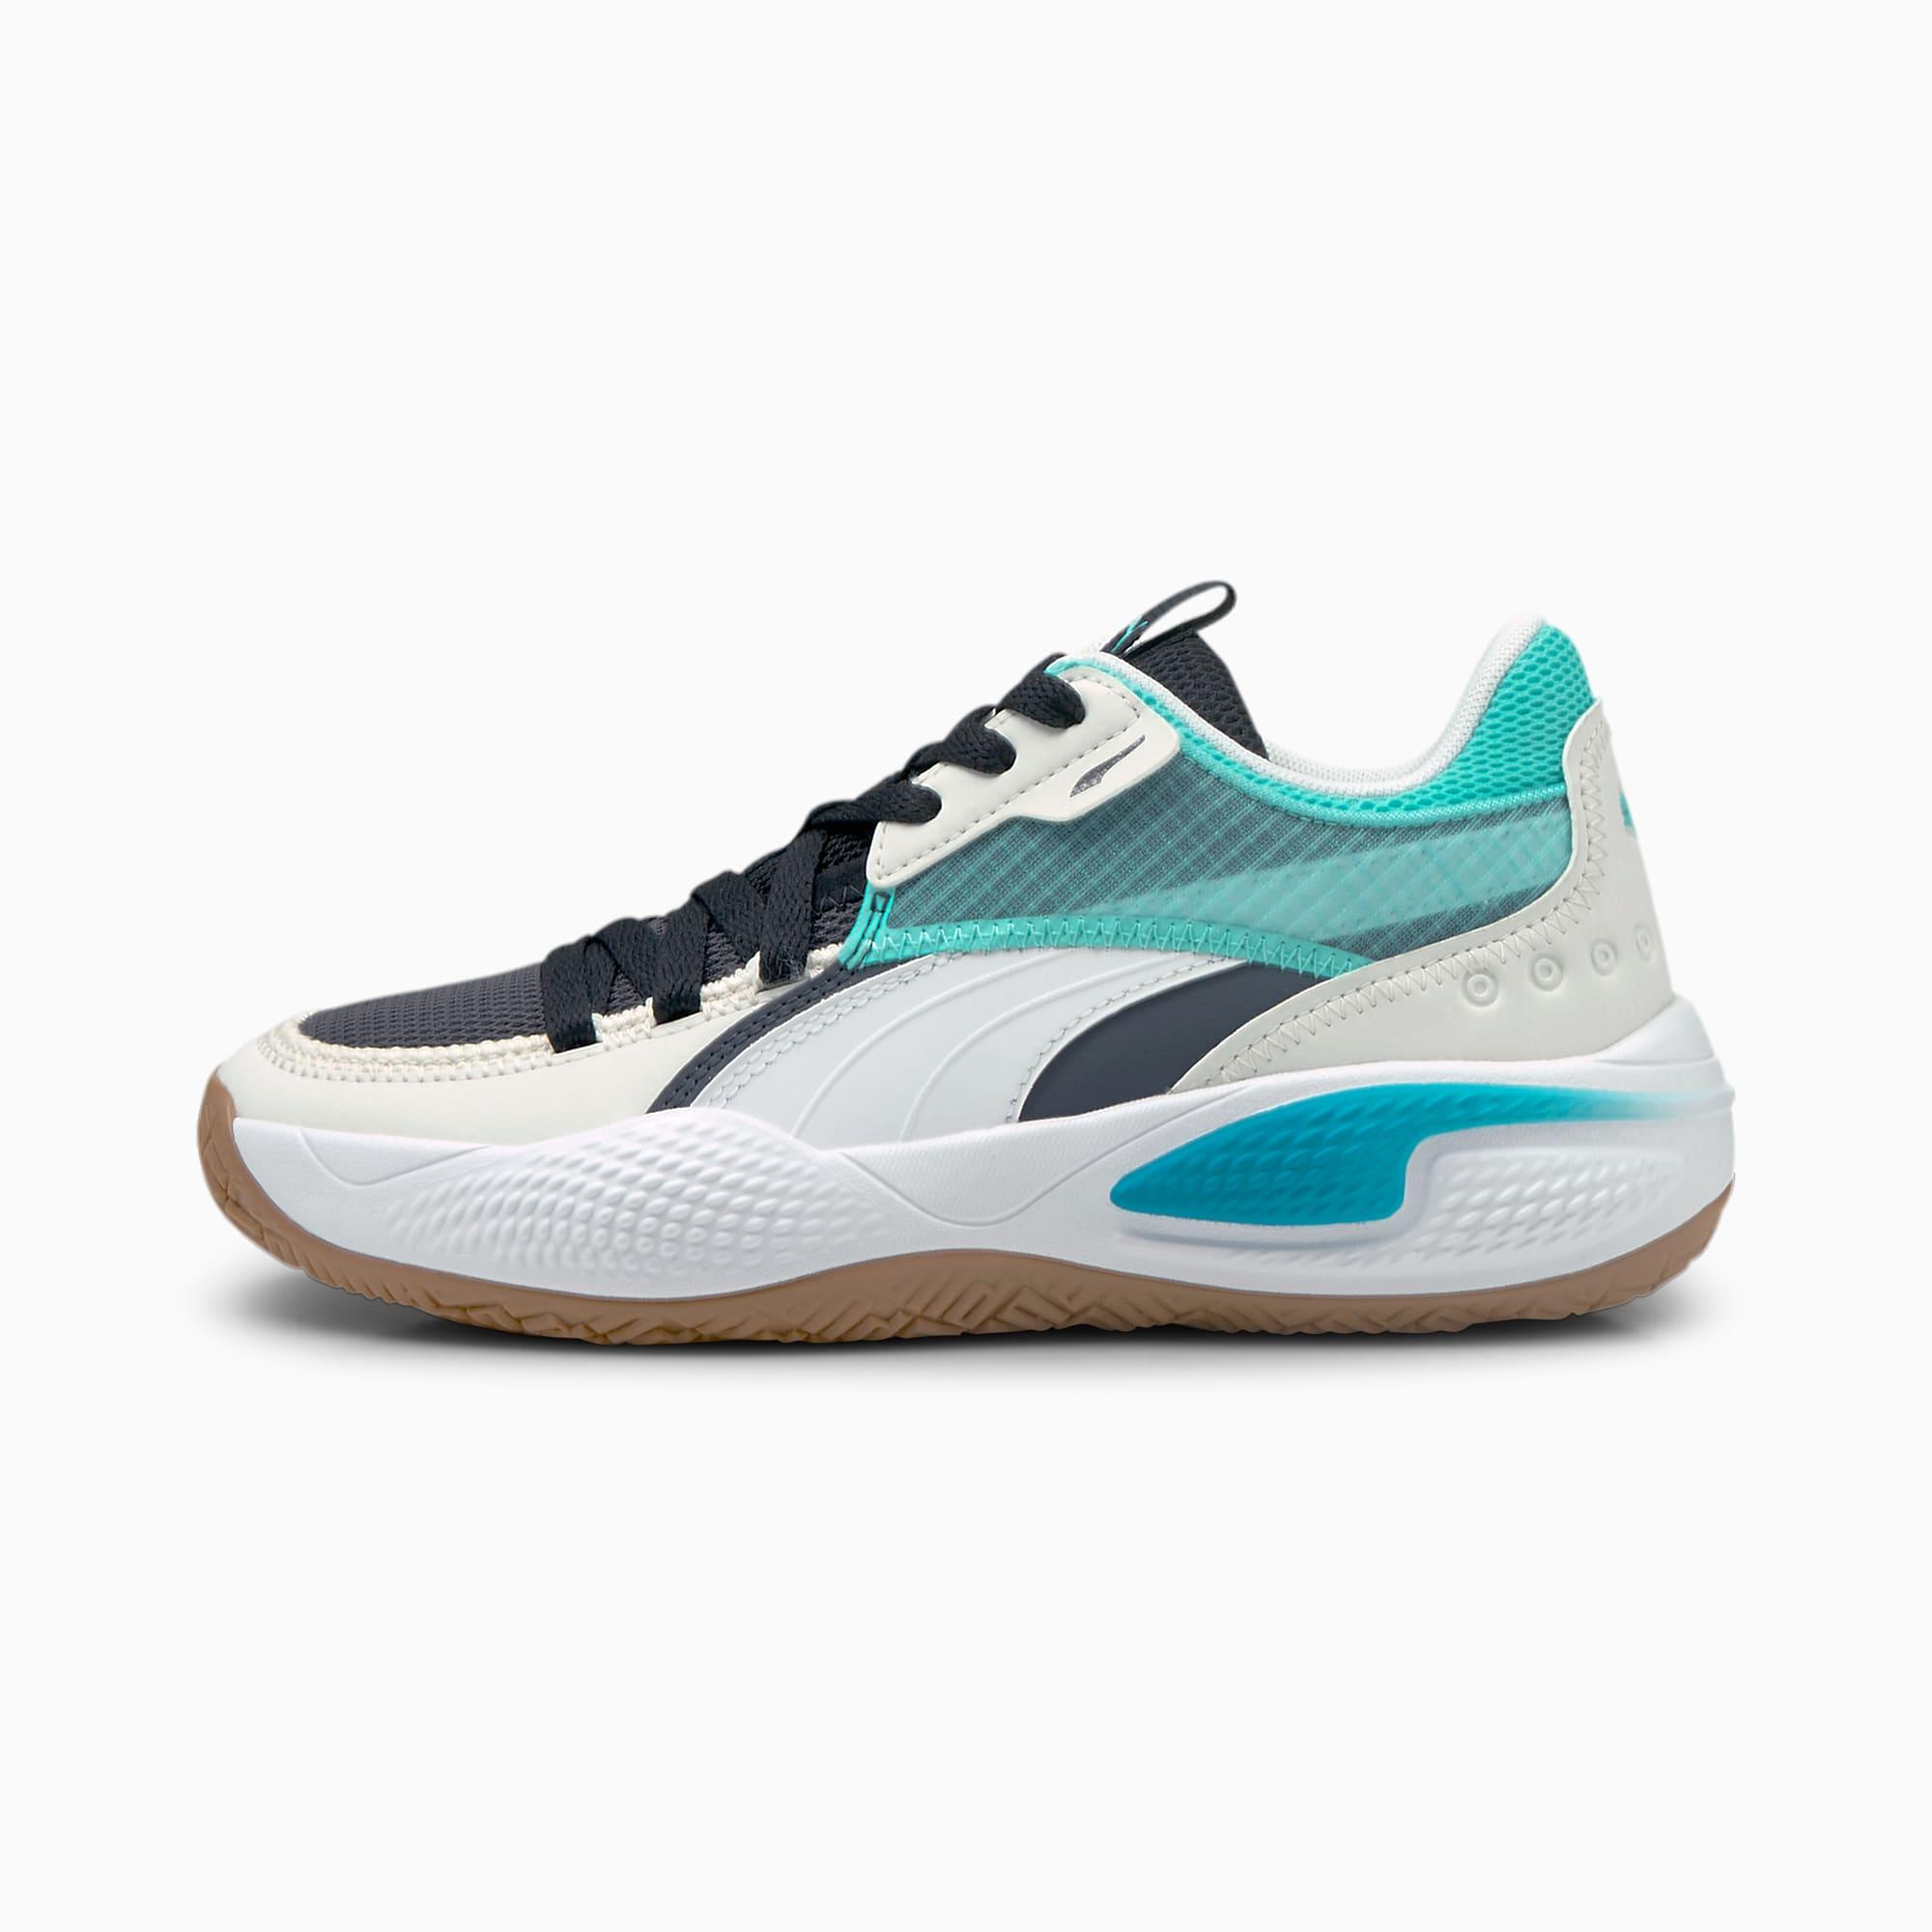 Zapatillas de Baloncesto Juveniles Court Rider Summer Days, Negro, Talla 37.5   PUMA